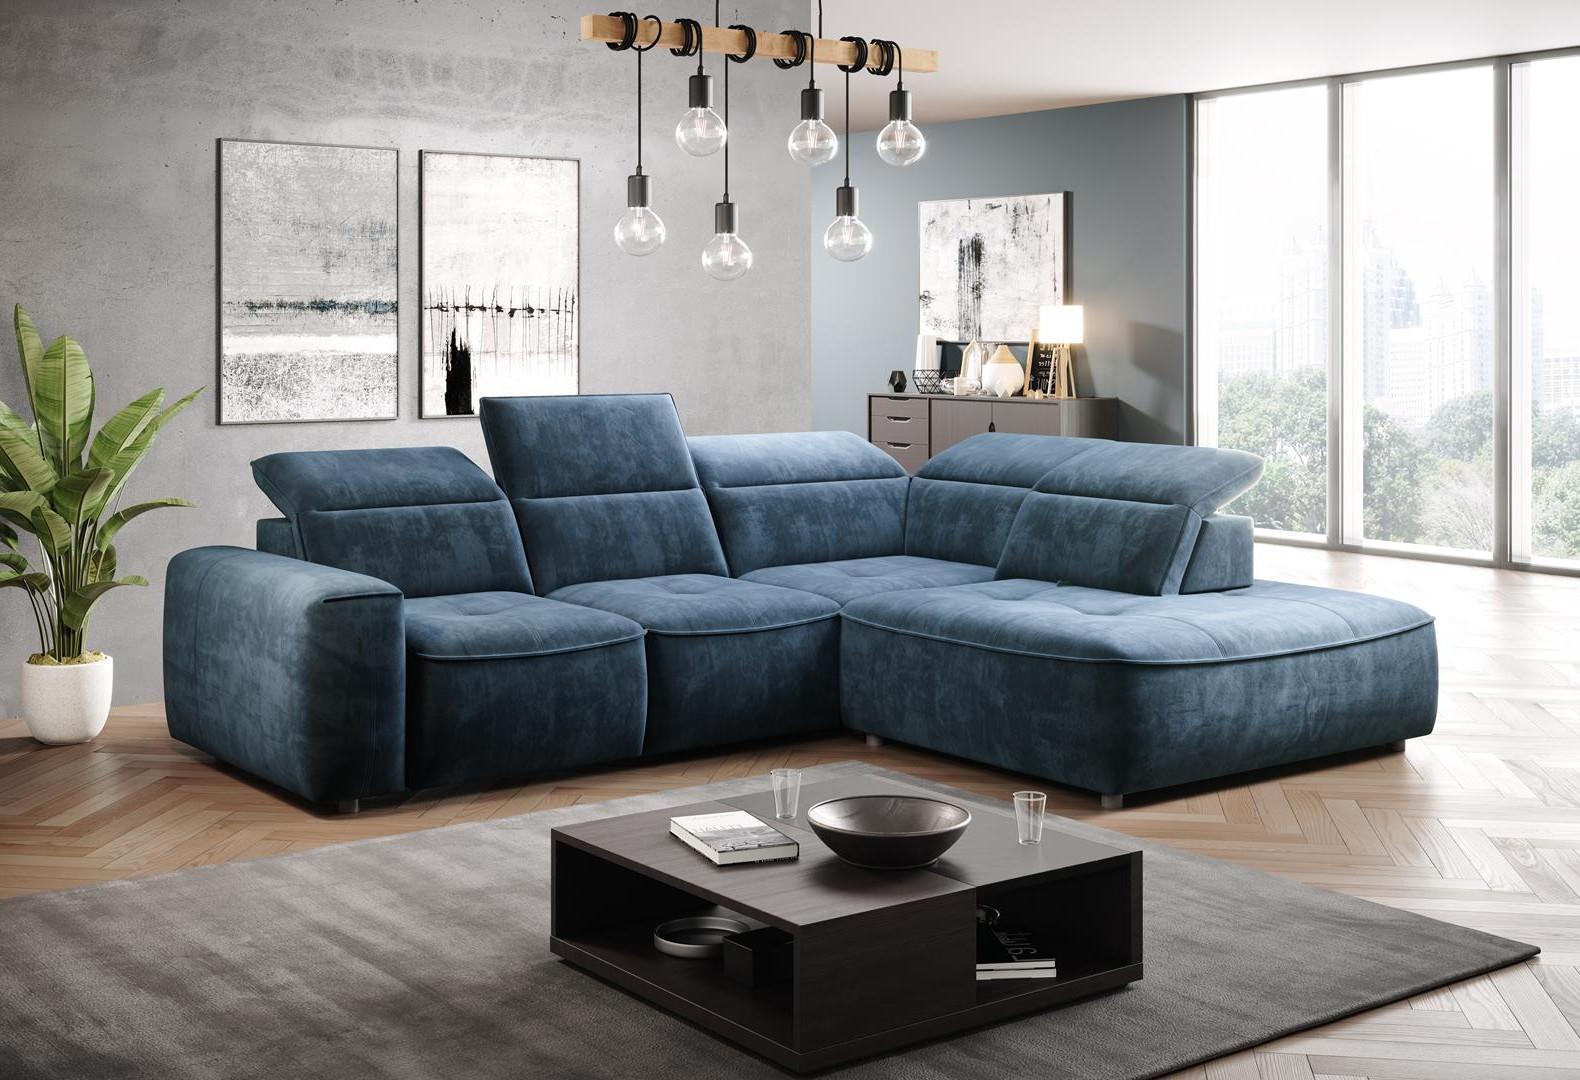 Coltar fix cu mecanism electric Relax si lada de depozitare, cu sezlong pe dreapta, tapitat cu stofa Colombo L Albastru, l296xA227xH81 cm